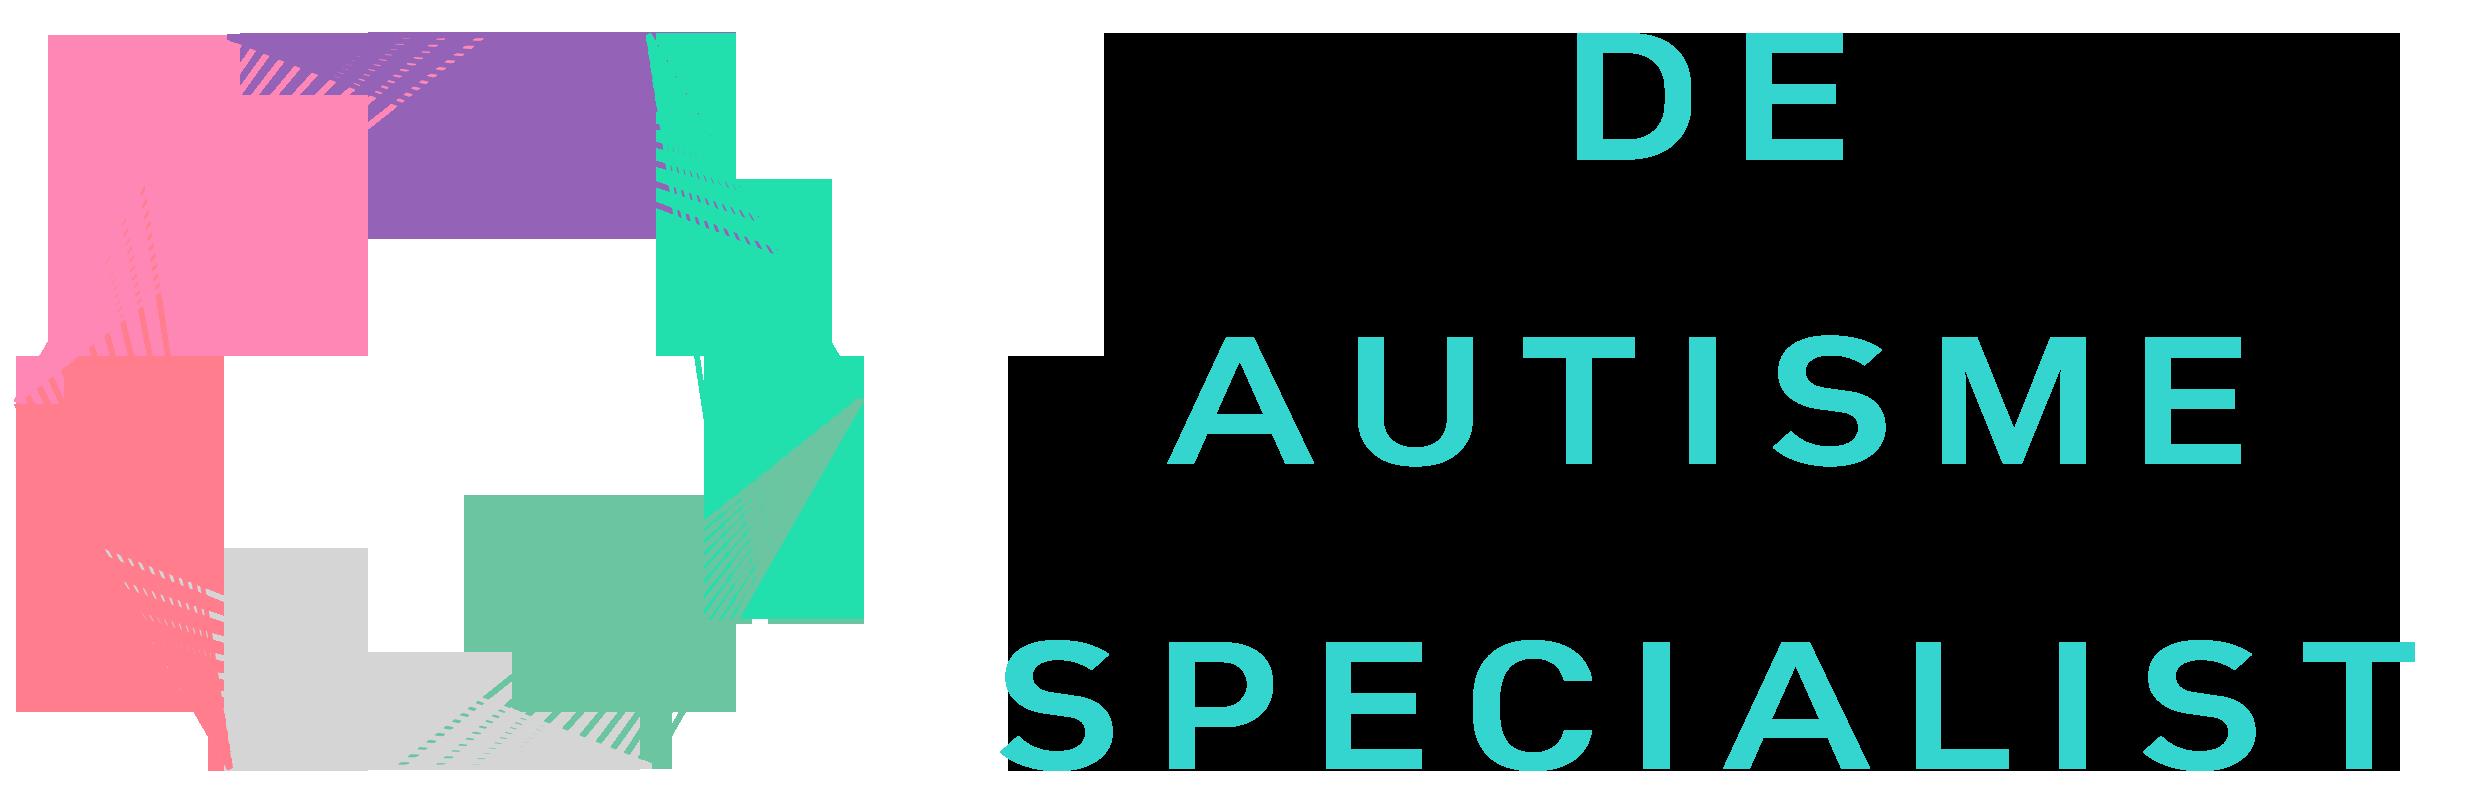 De Autismespecialist